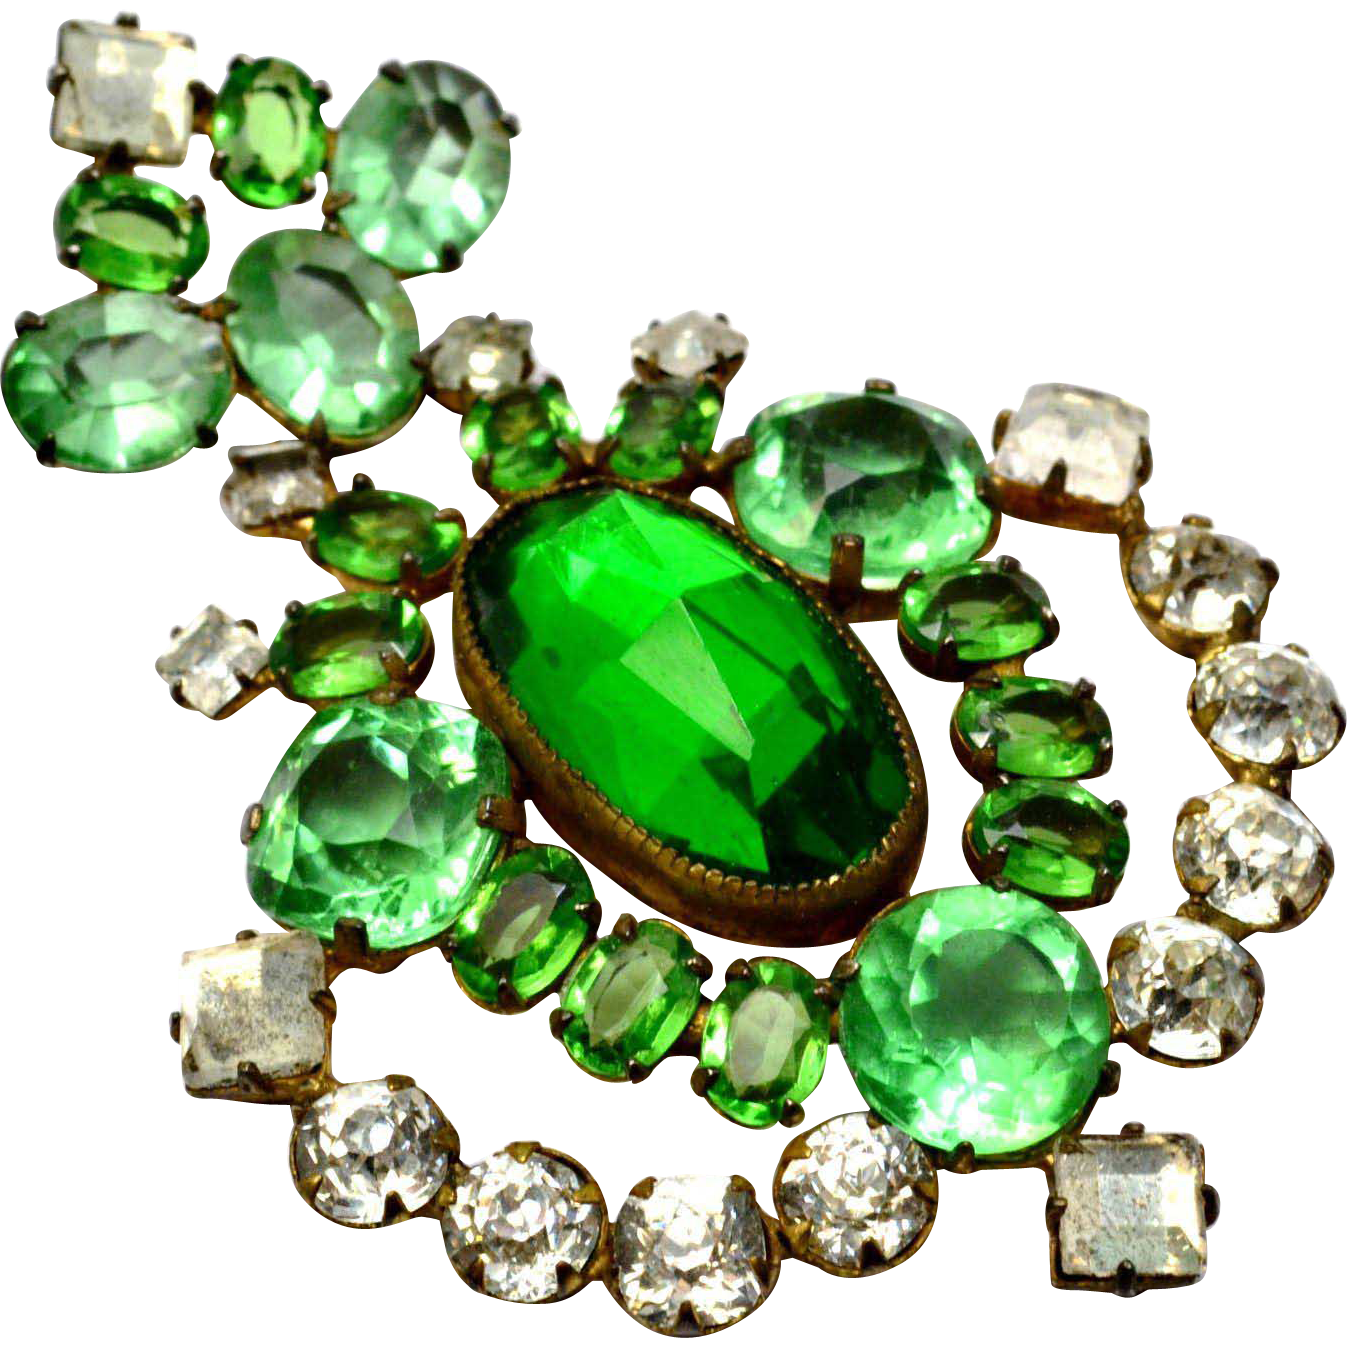 Vintage 1940s huge green glass clear rhinestone shield shaped brooch